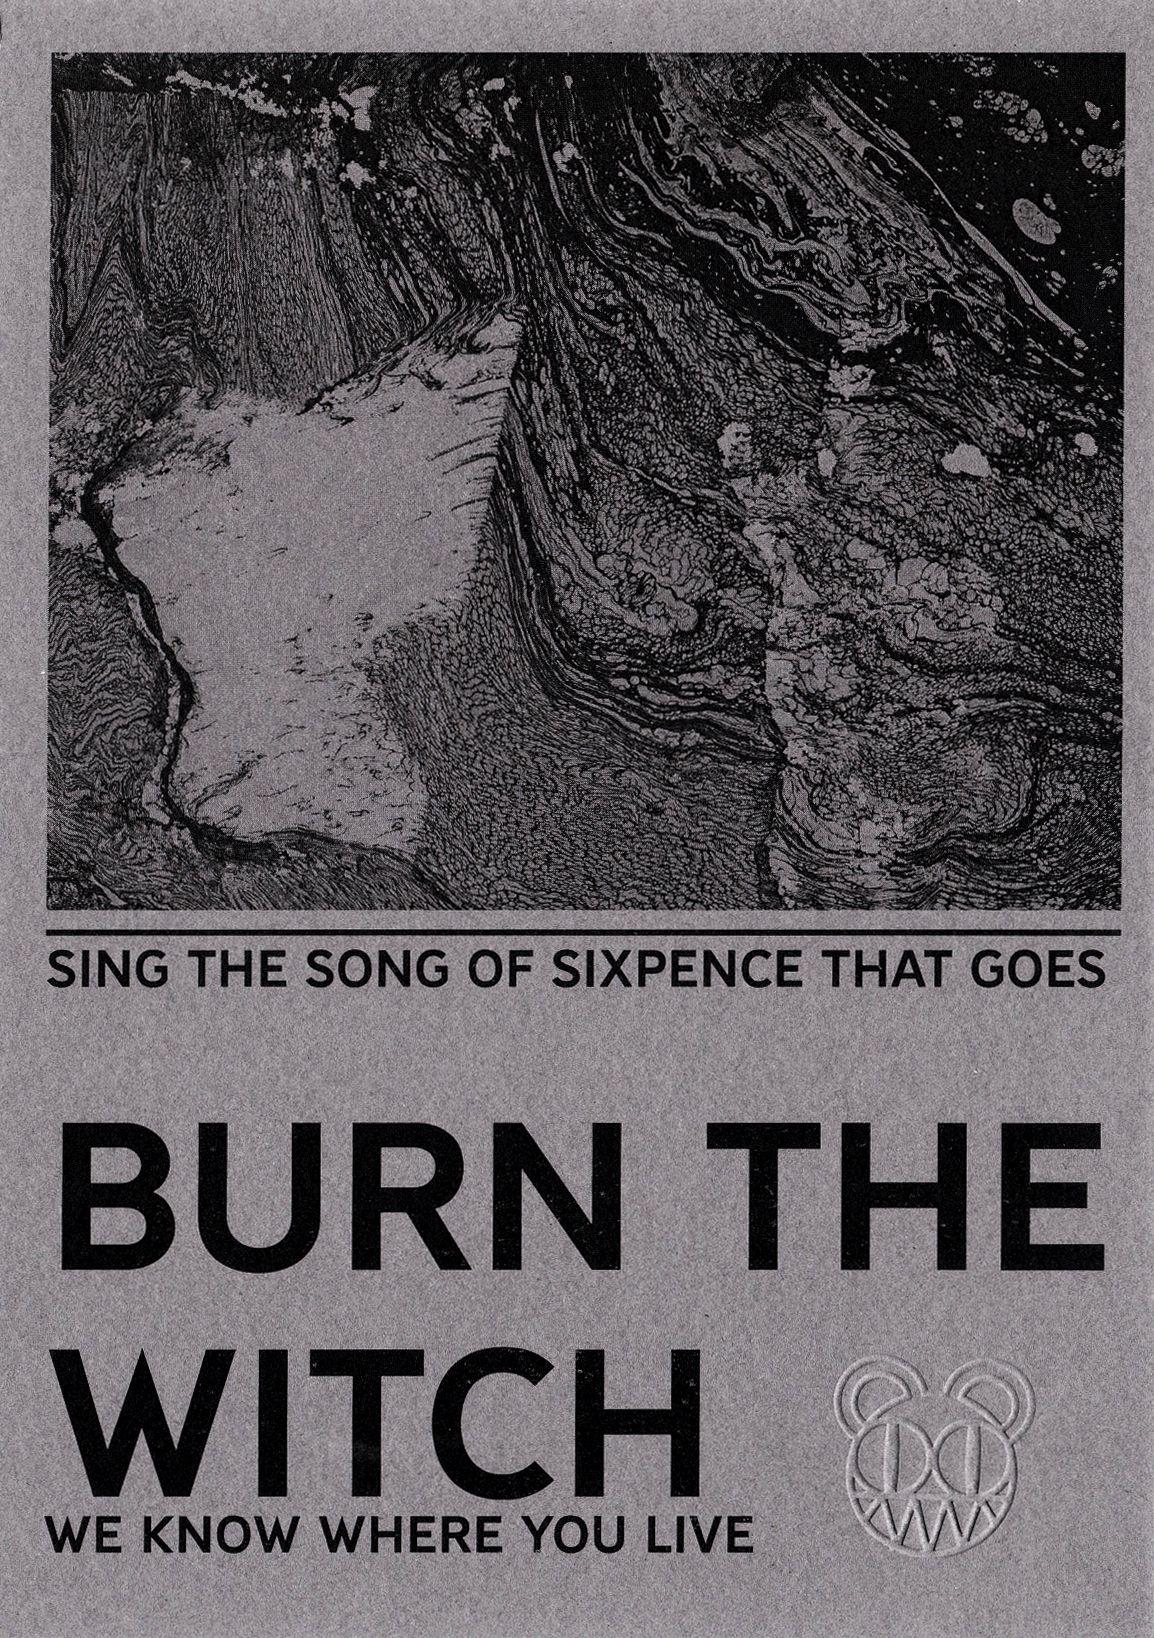 Radiohead burn the witch pamphlet edited dvdbd art radiohead burn the witch pamphlet edited radiohead poster radiohead lyrics izmirmasajfo